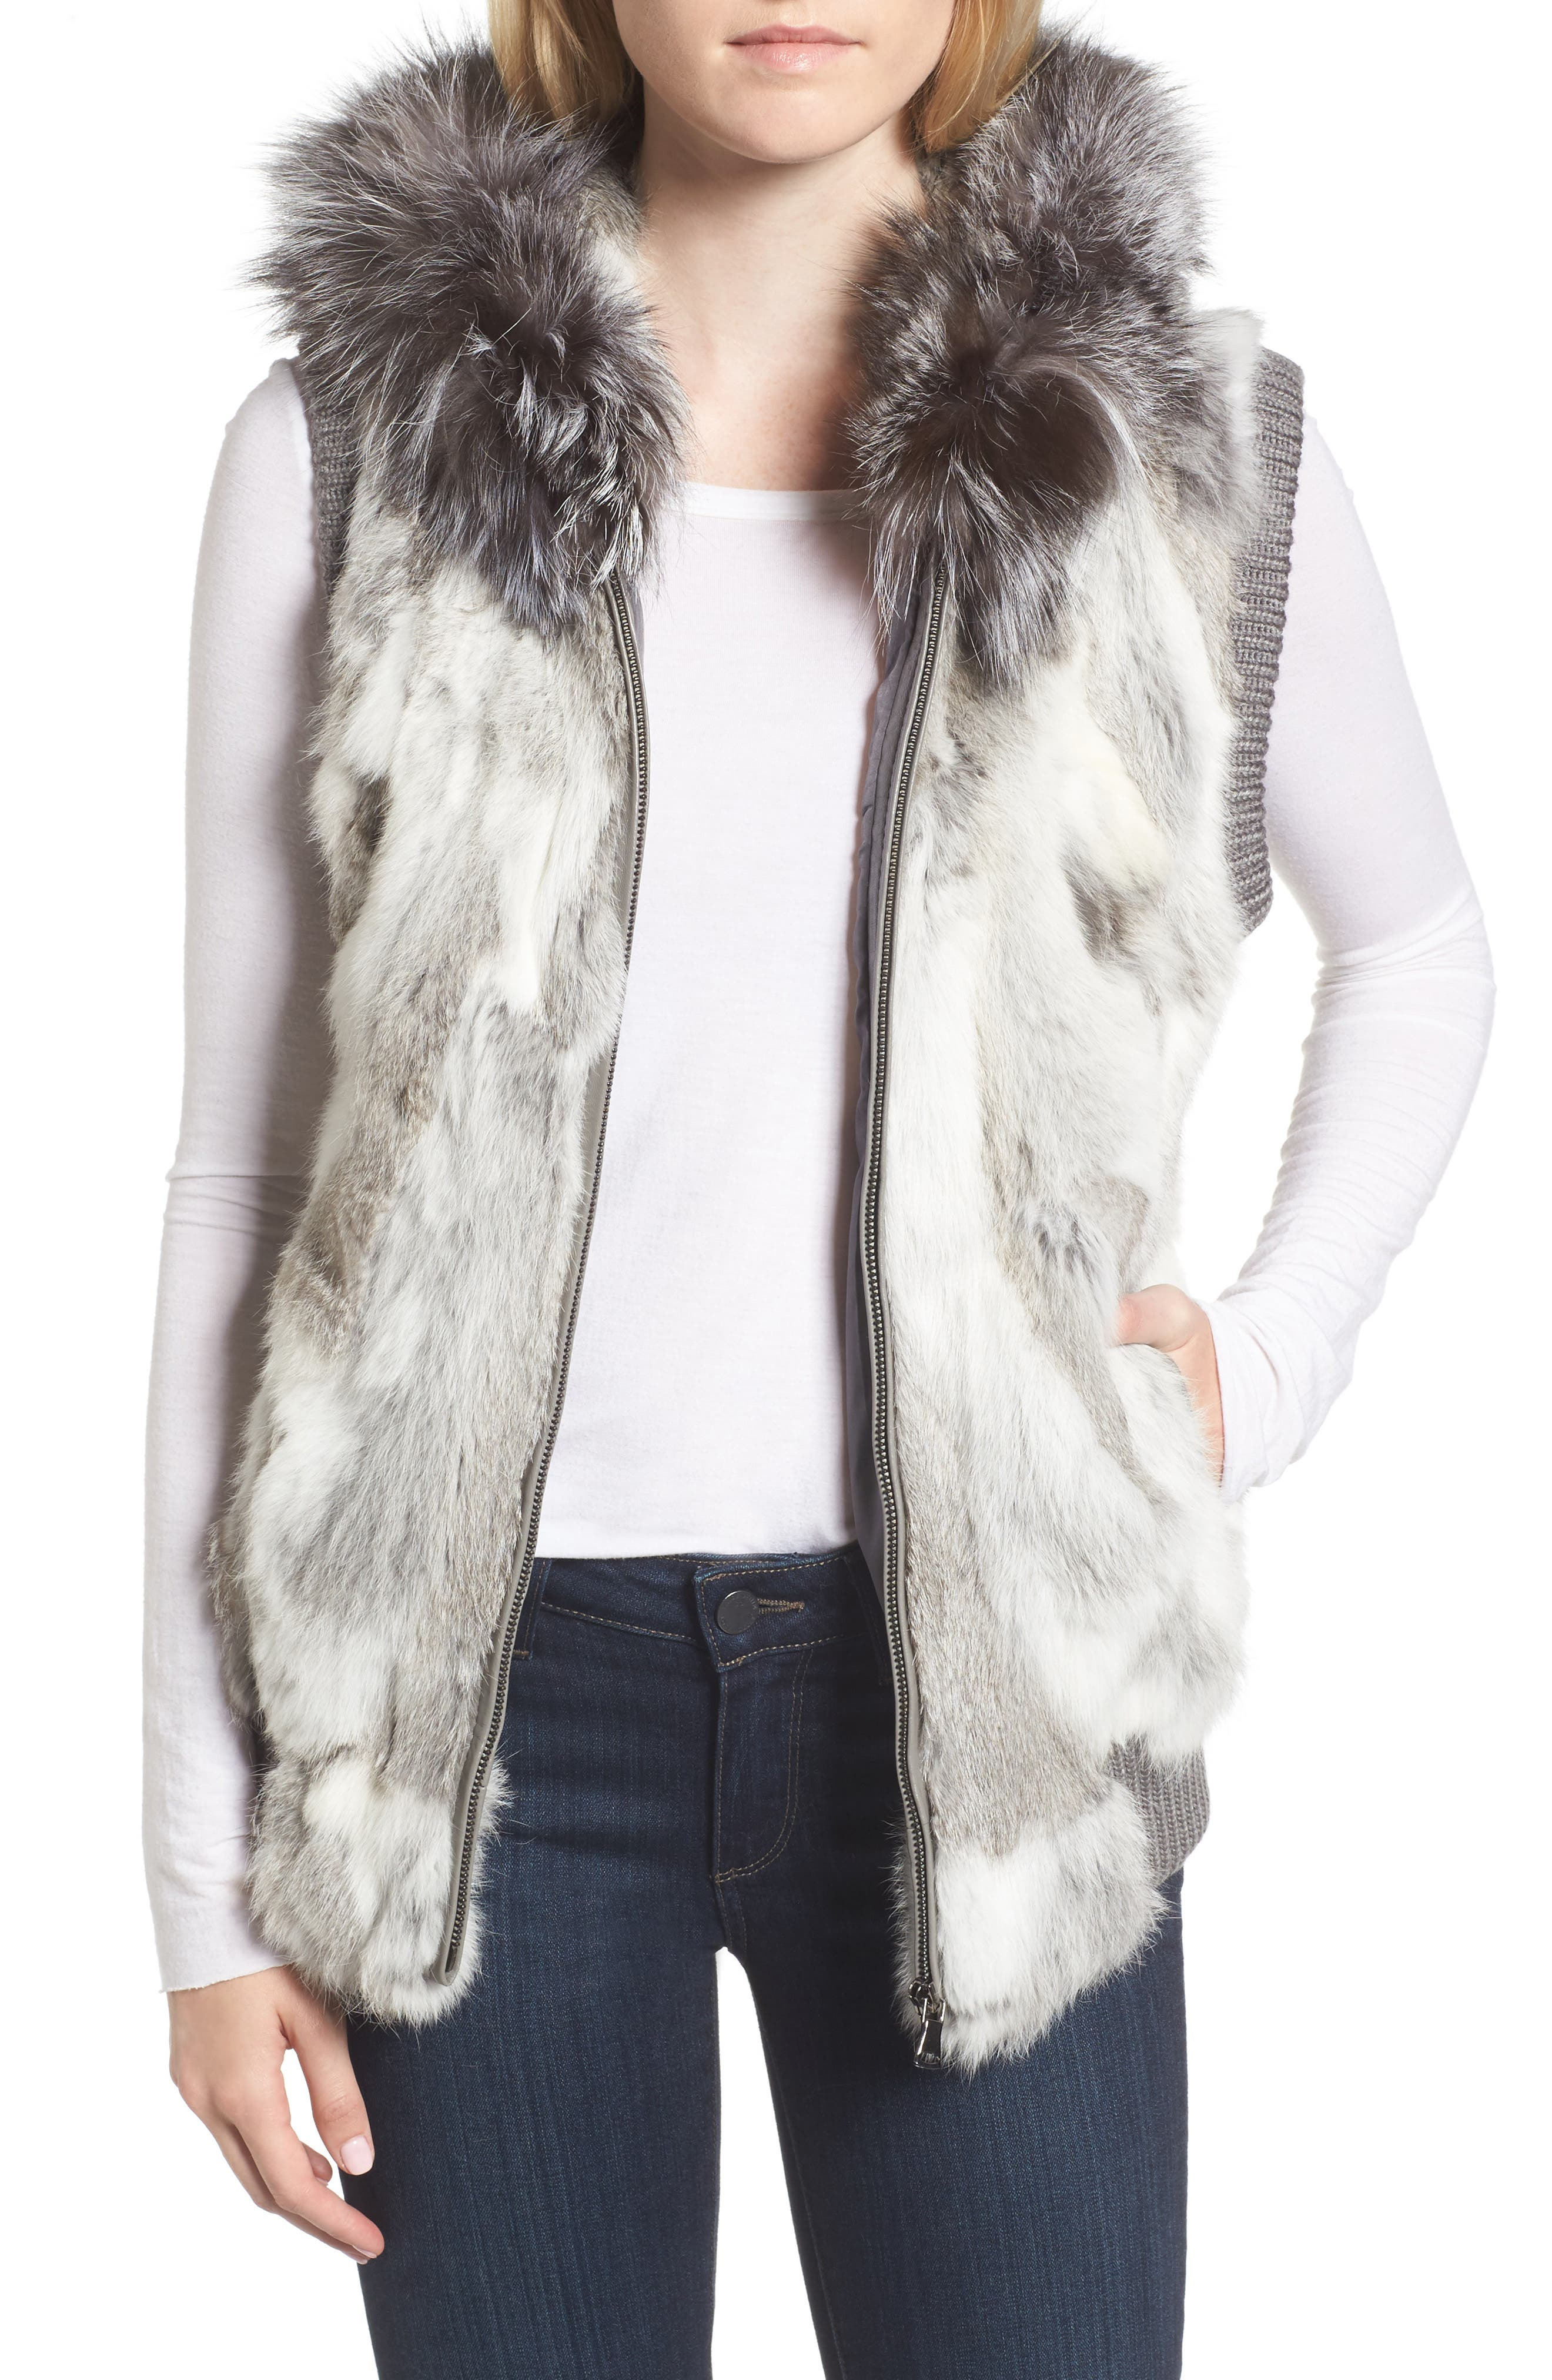 Jocelyn Genuine Rabbit Fur Hooded Vest with Genuine Fox Fur Trim